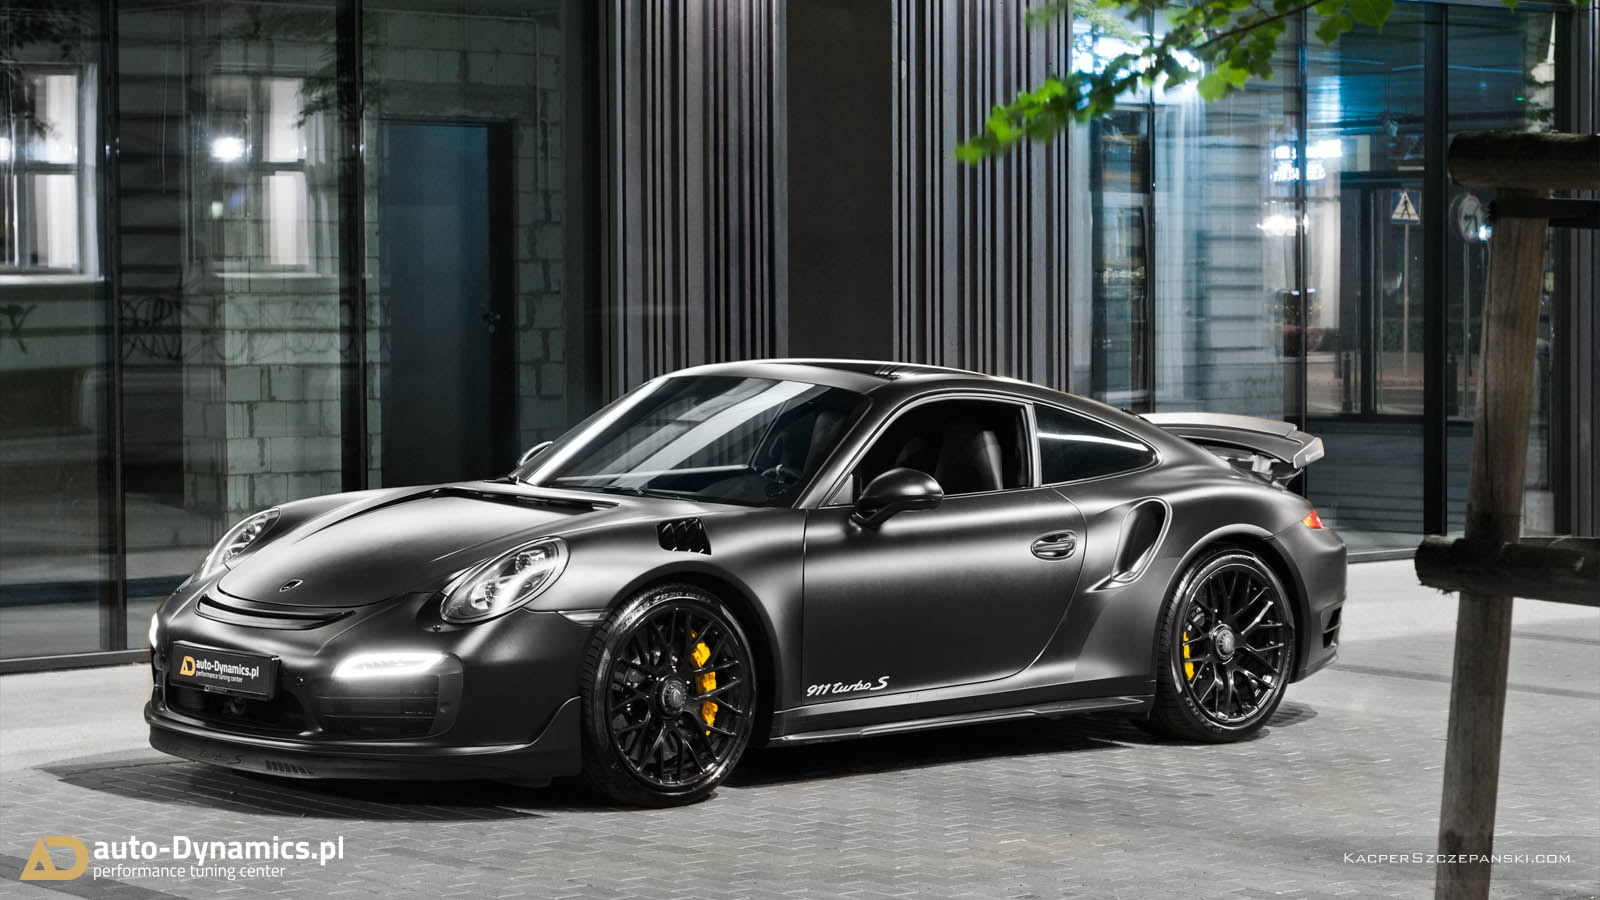 Porsche 911 Turbo S by Auto-Dynamics (7)